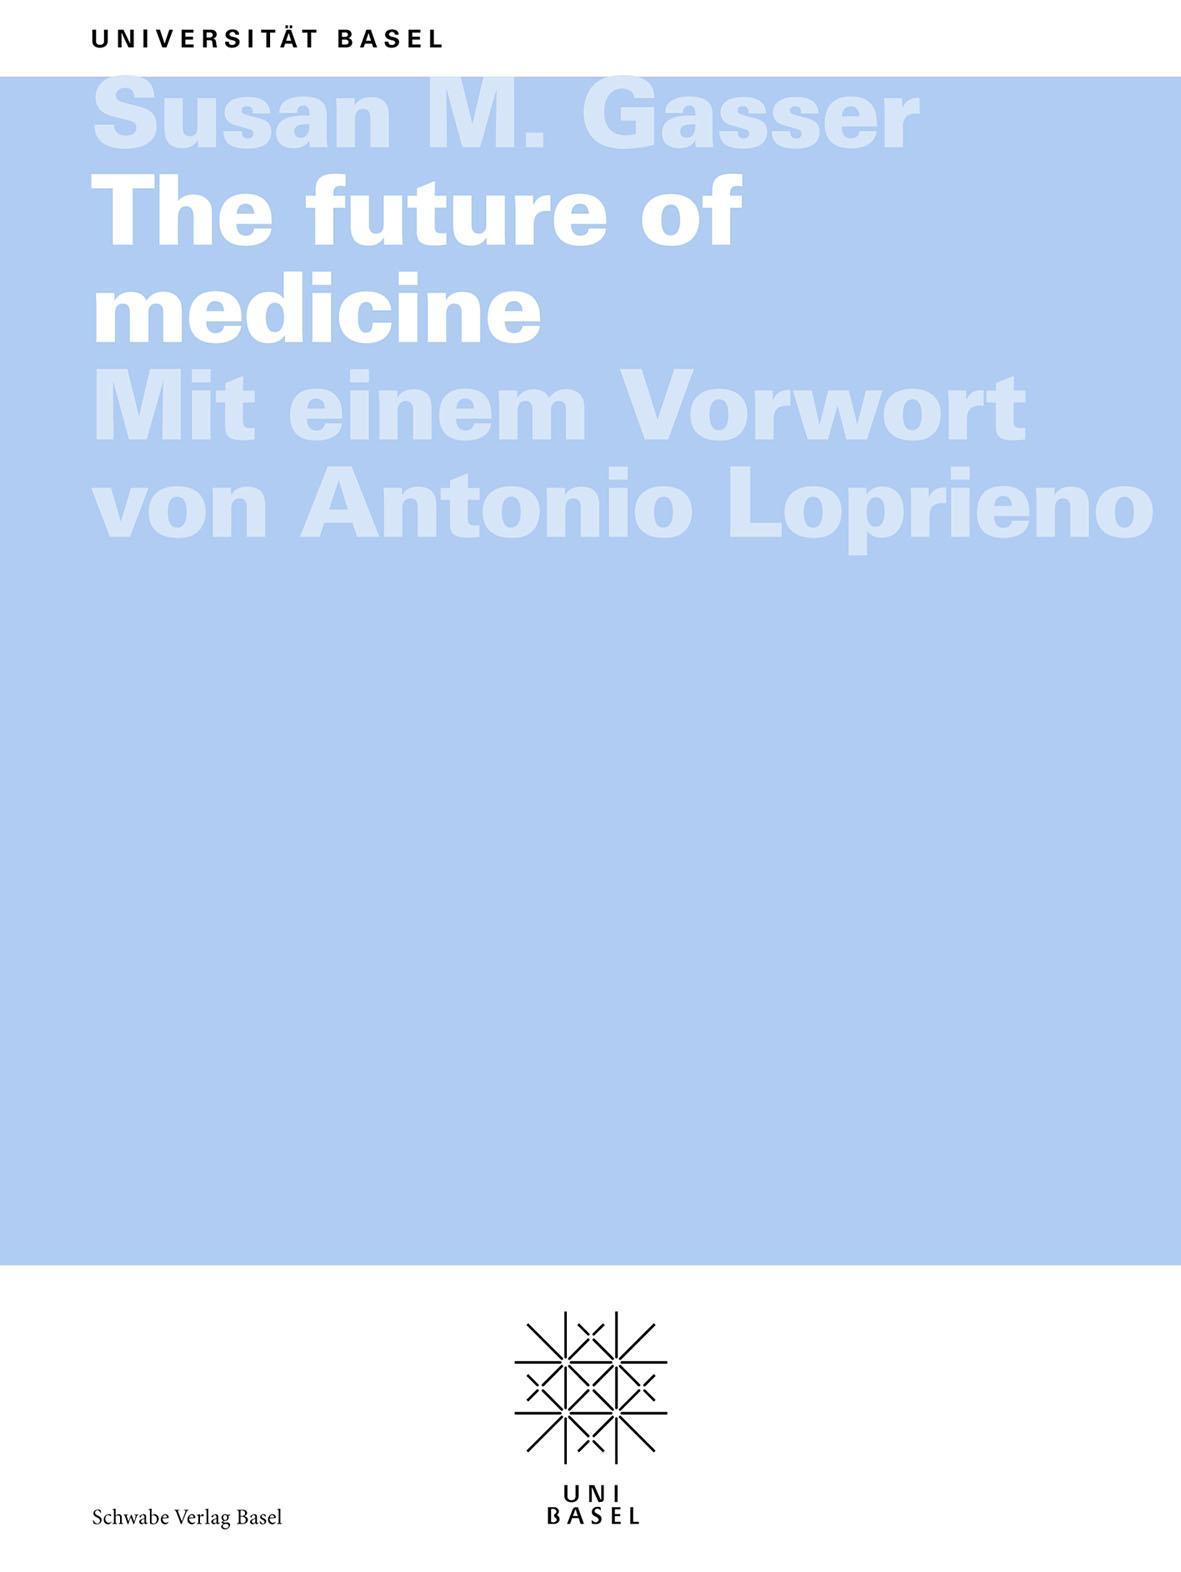 The future of medicine, Susan M. Gasser